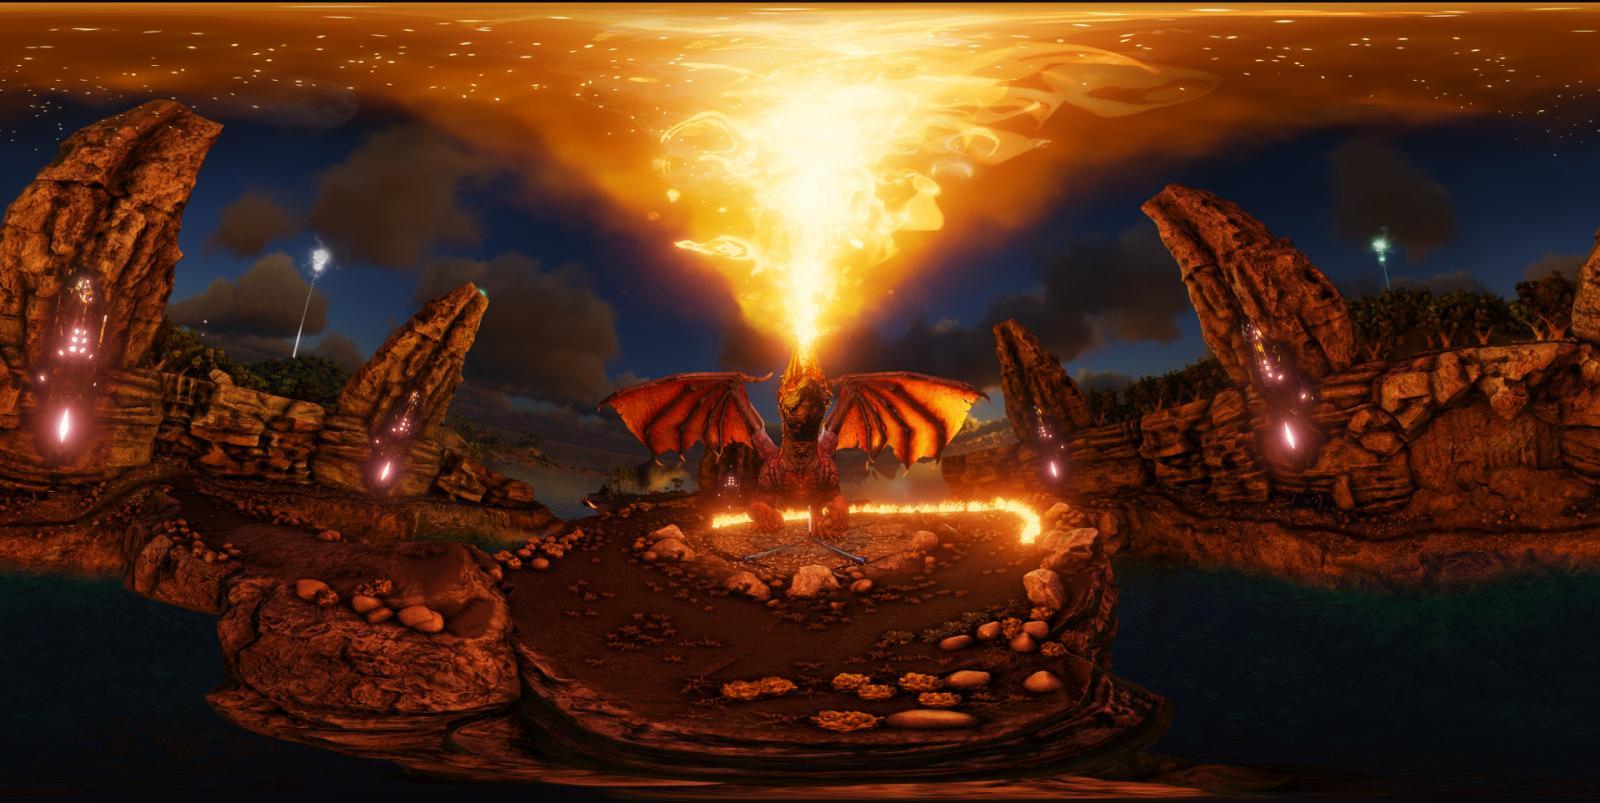 large.58140f8bb528a_EXFIB0-DragonAtack.jpg